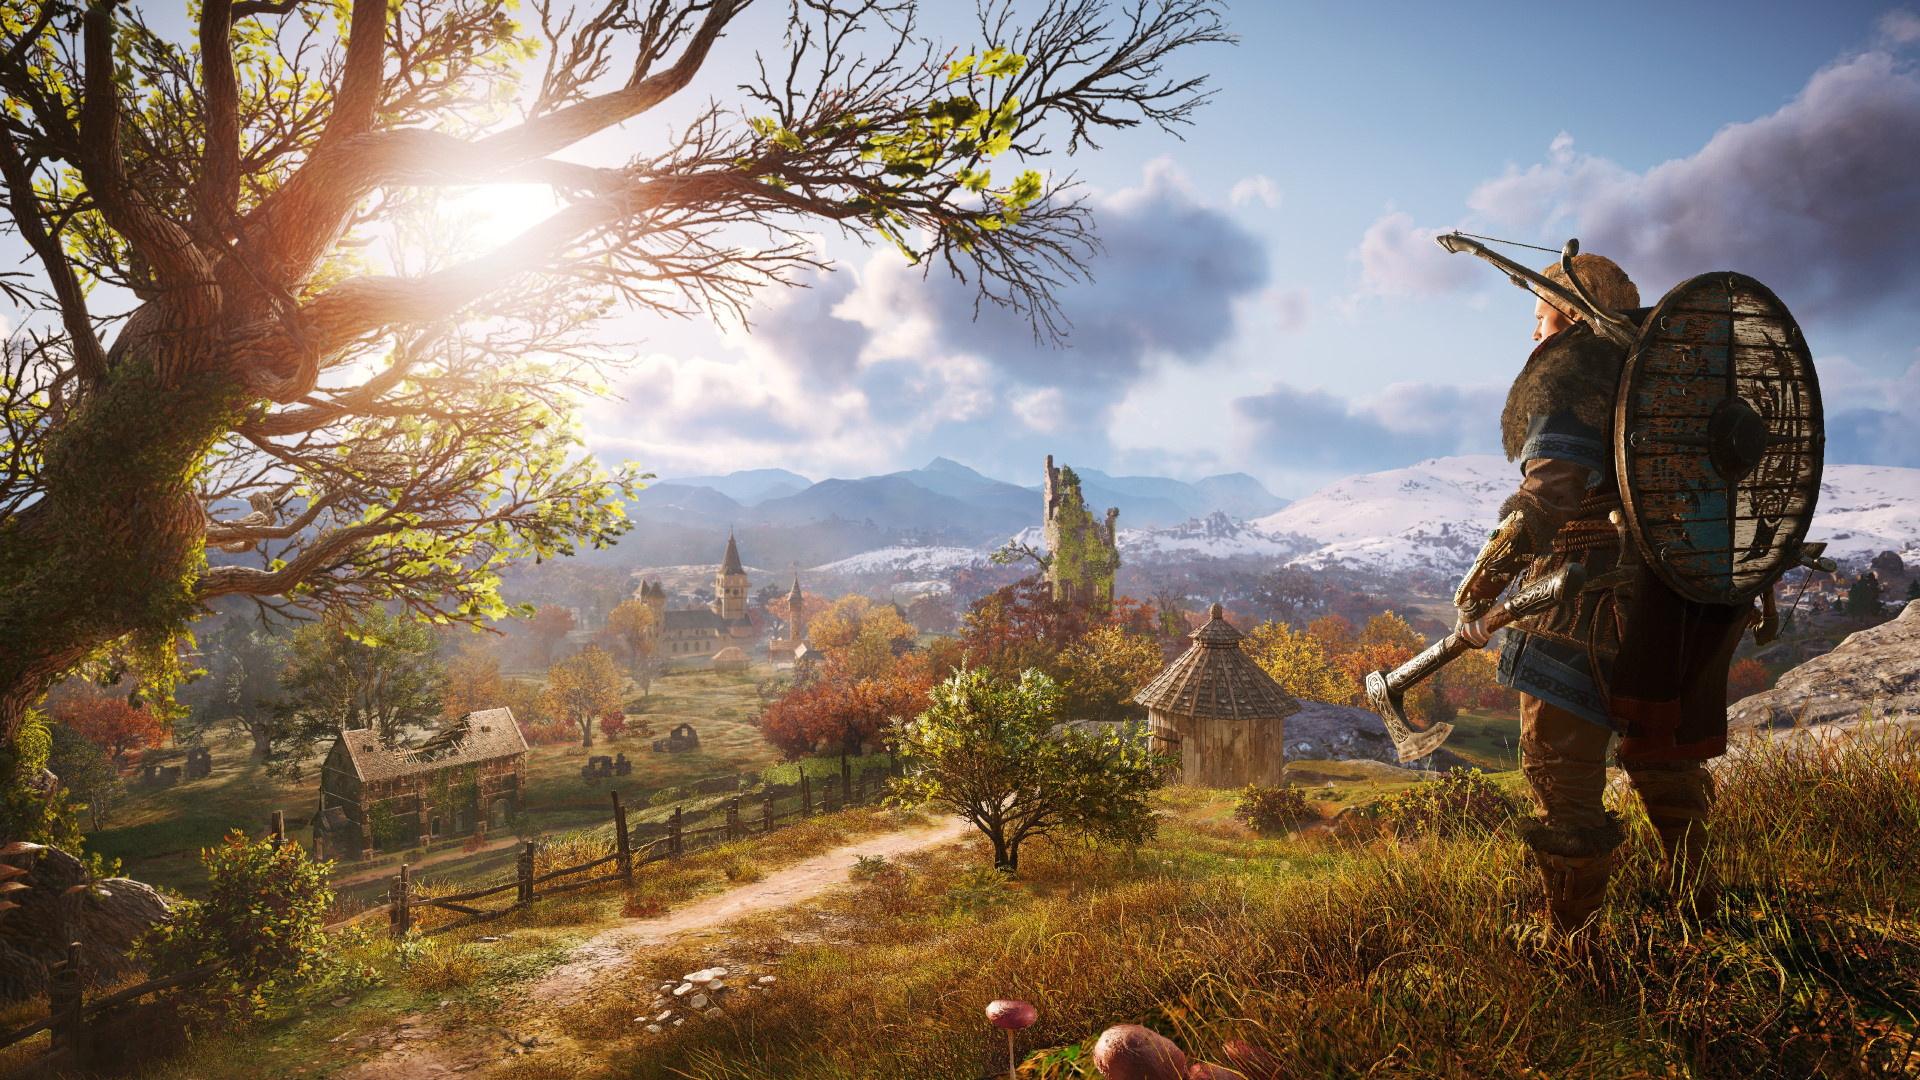 Режиссёр Джон Карпентер назвал Assassin's Creed Valhalla невероятной игрой